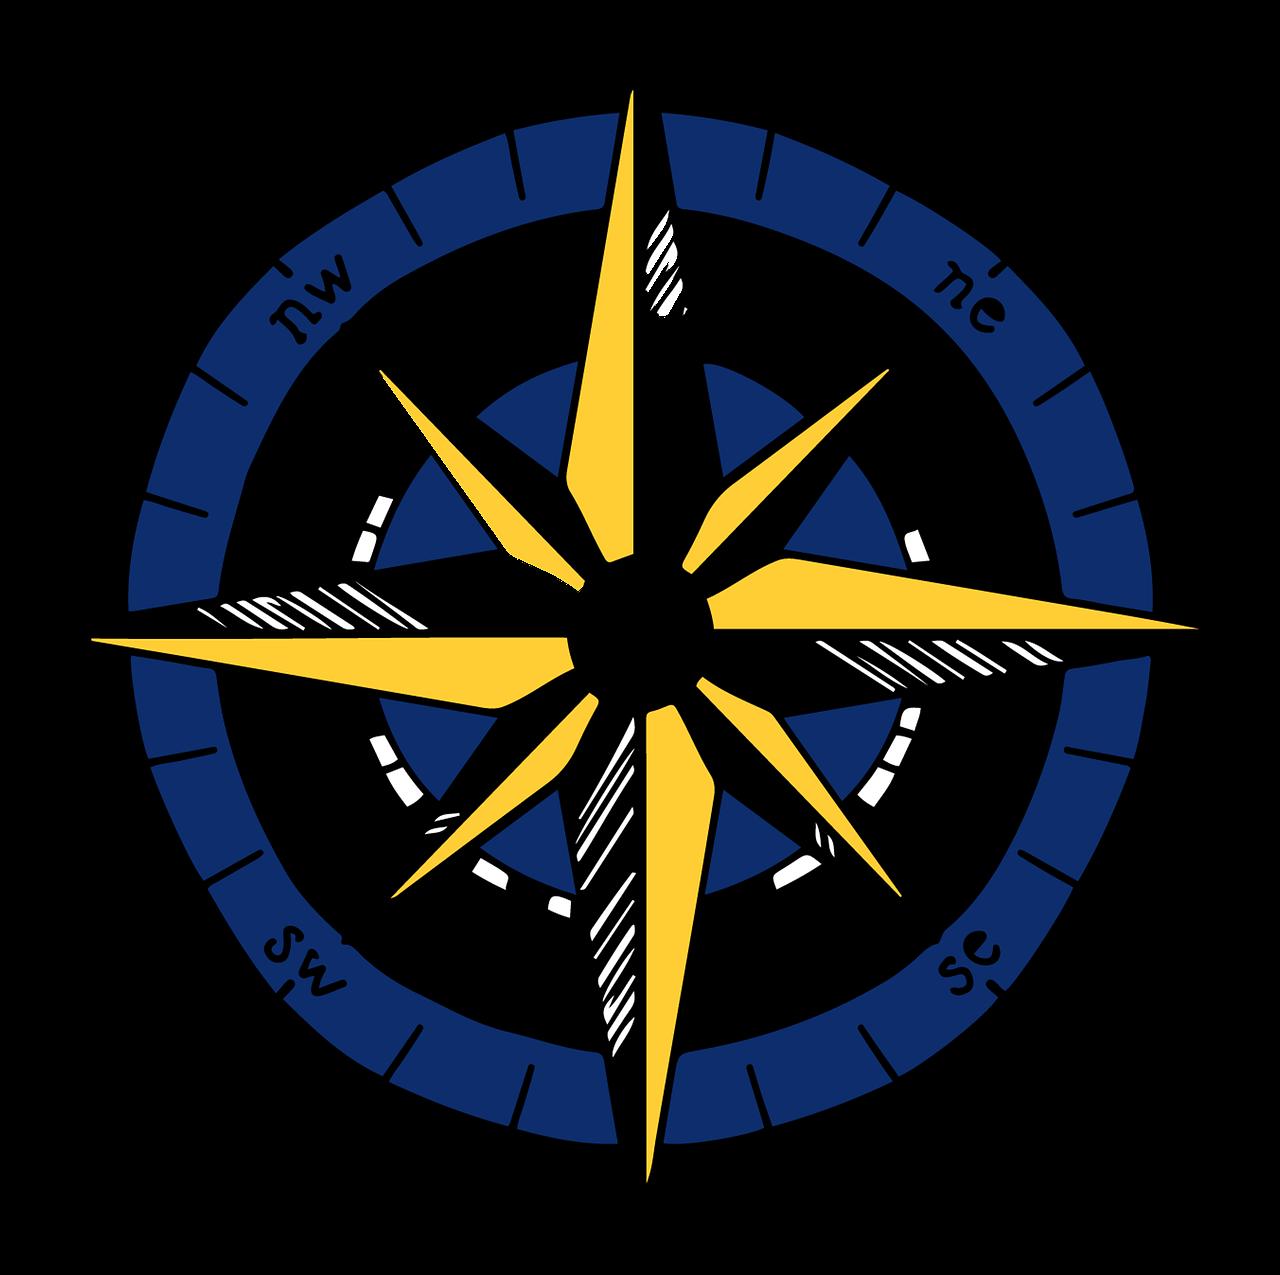 compass-4881349_1280